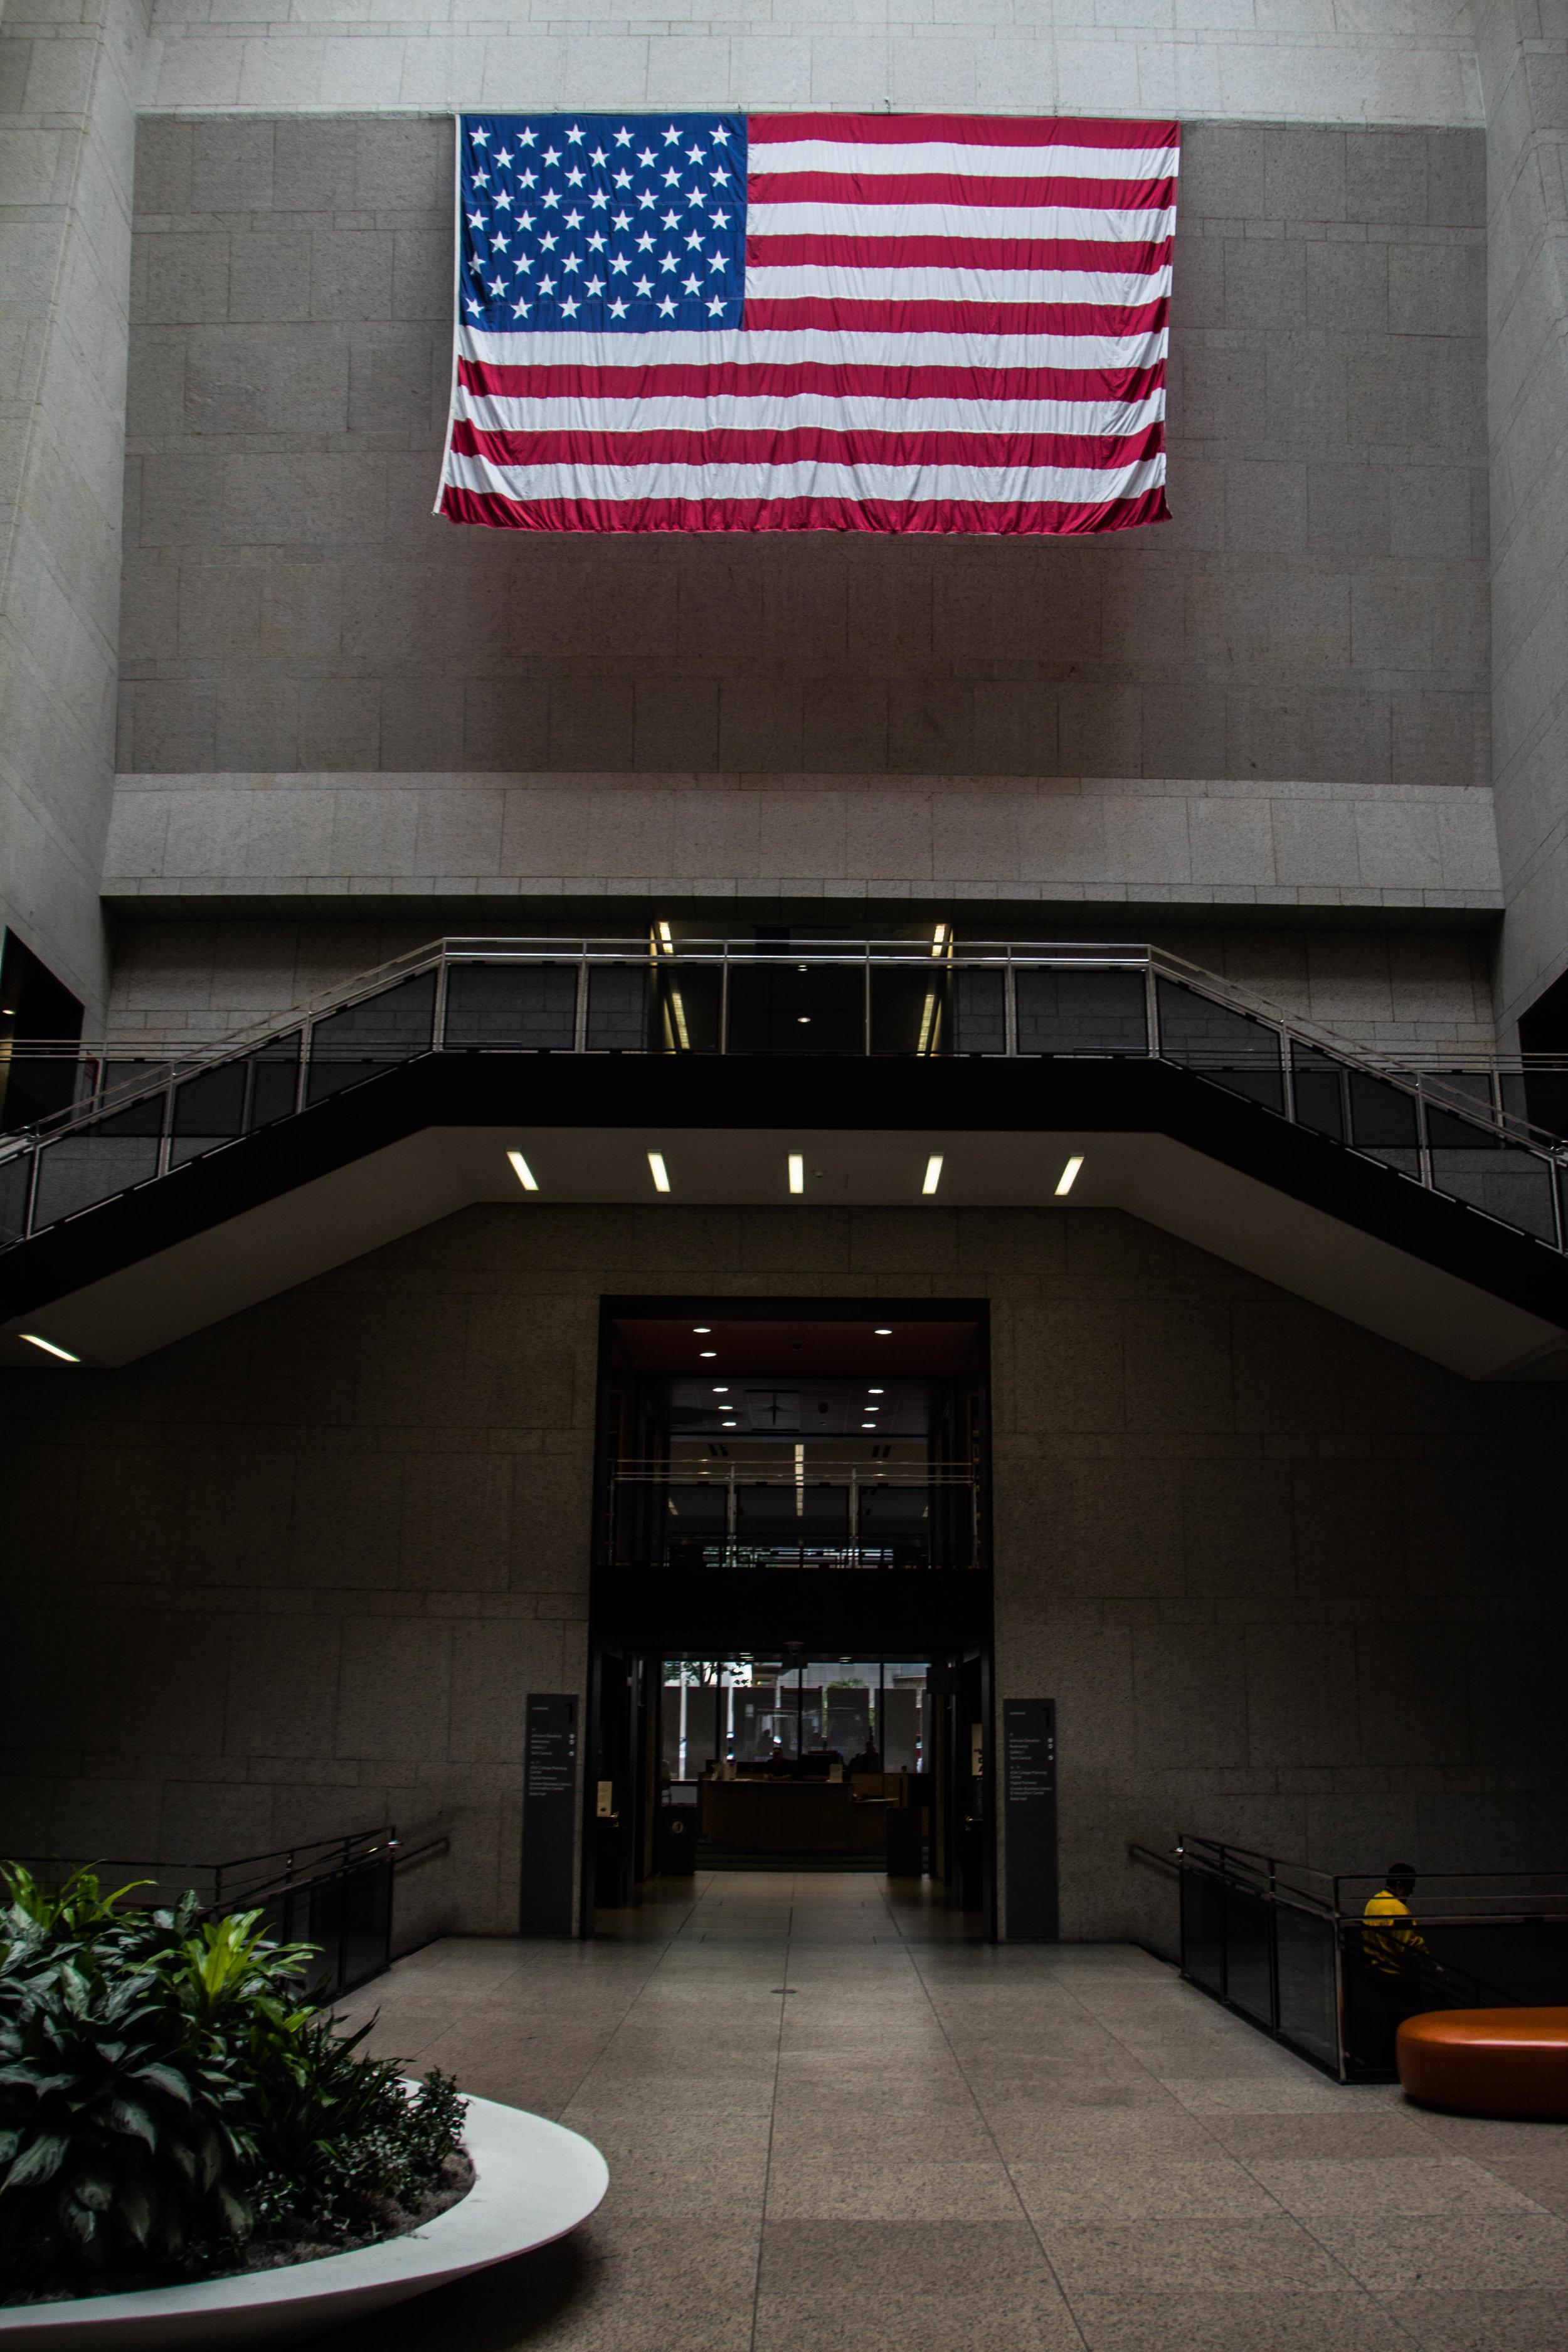 boston-public-library-photography-16.jpg